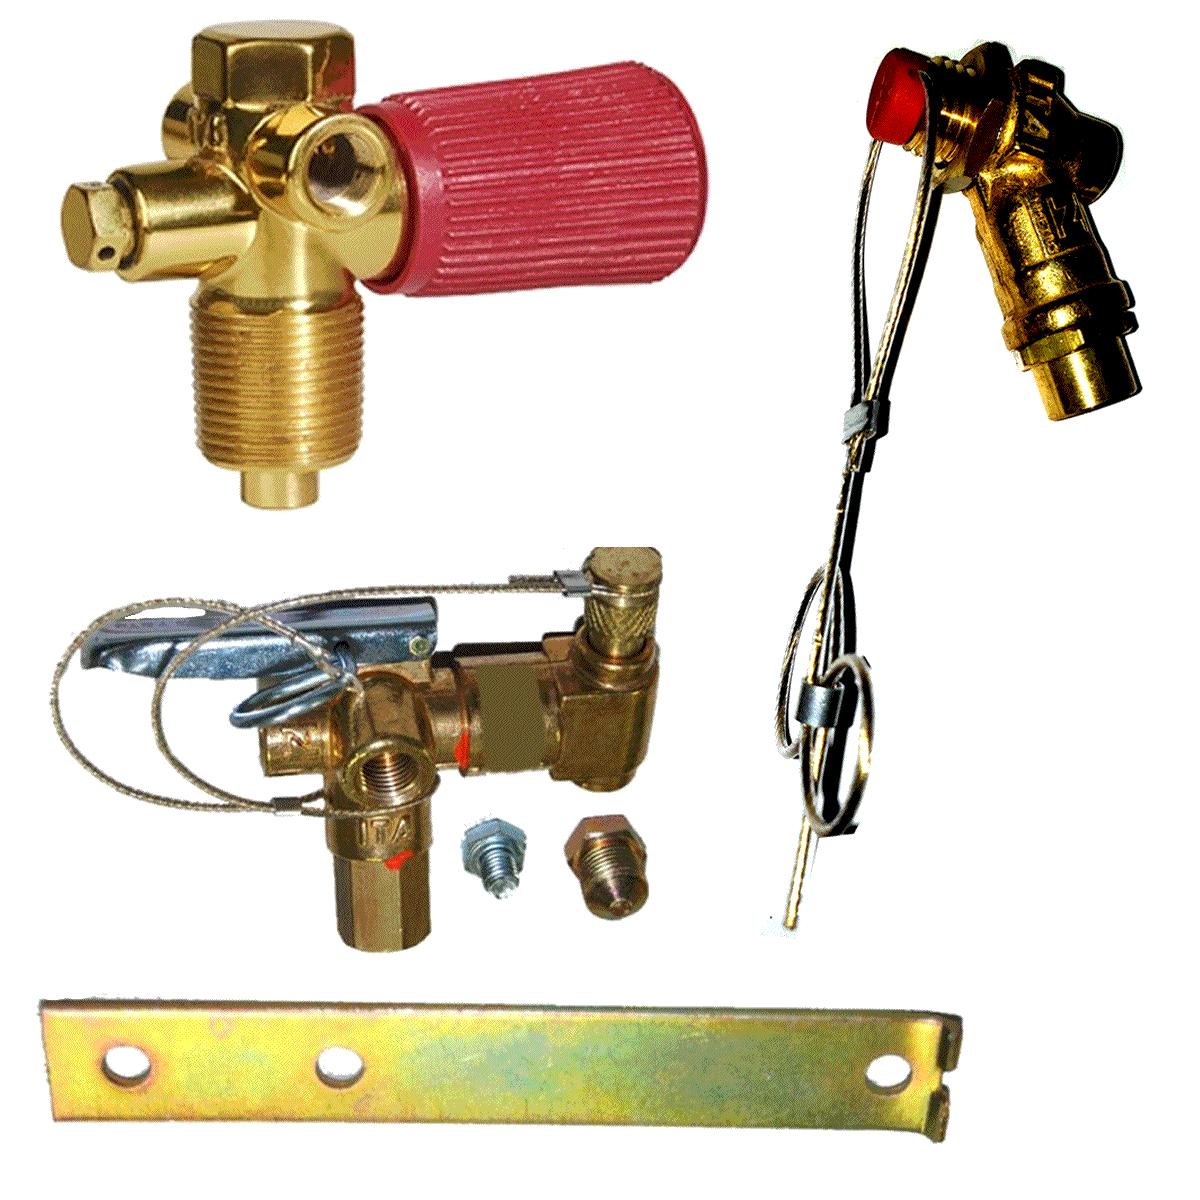 Kit 3 Válvulas GNV ITA Abastecimento Cilindro e Externa